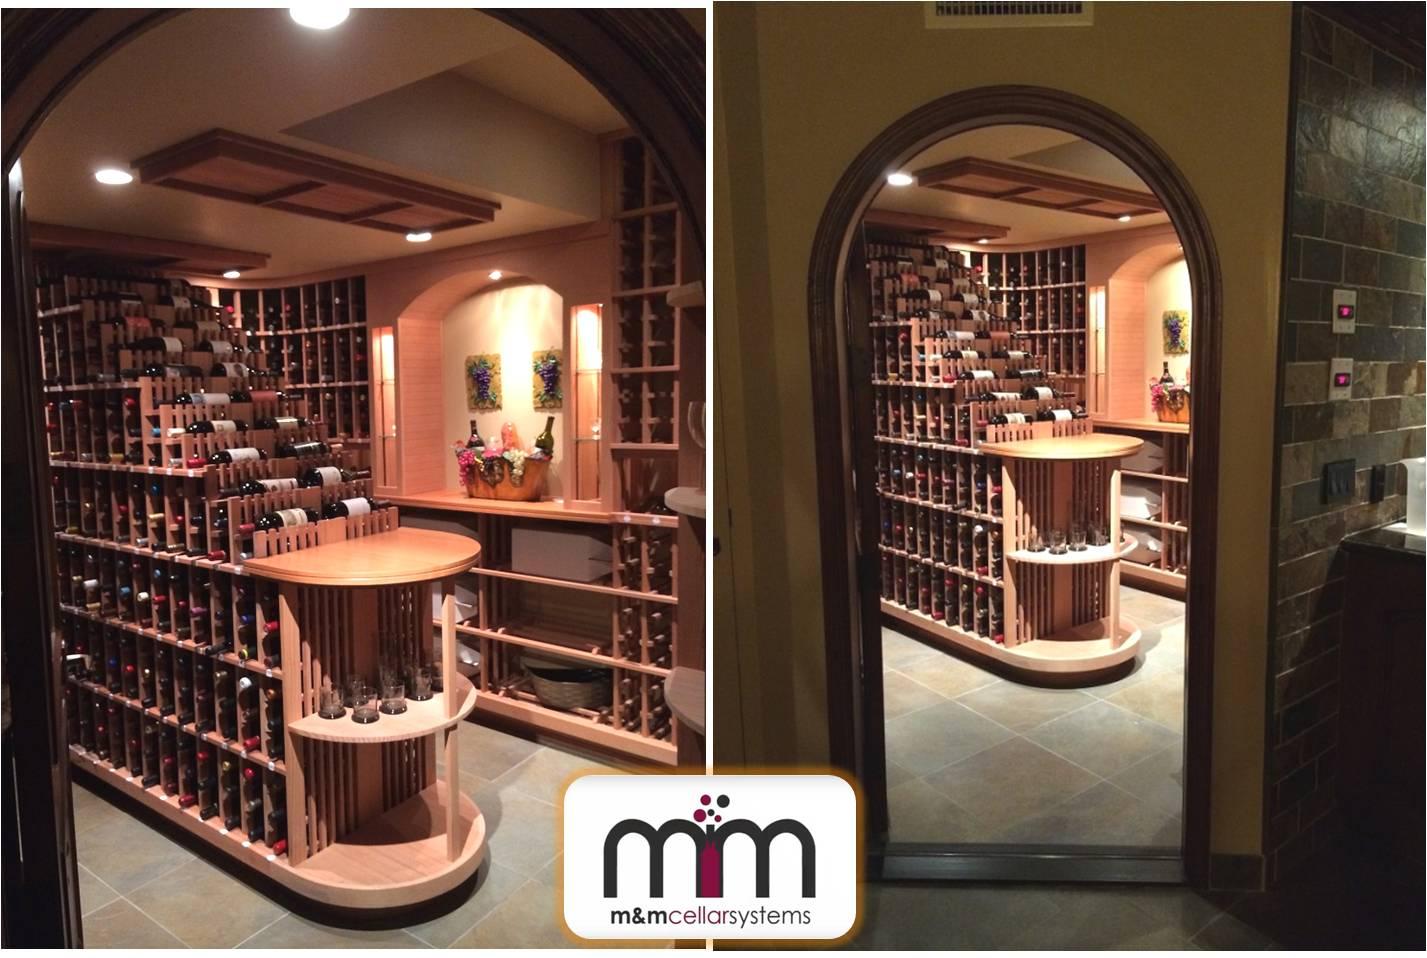 Wine Cellar Refrigeration Installation Project in Bel Air, Miami, FL